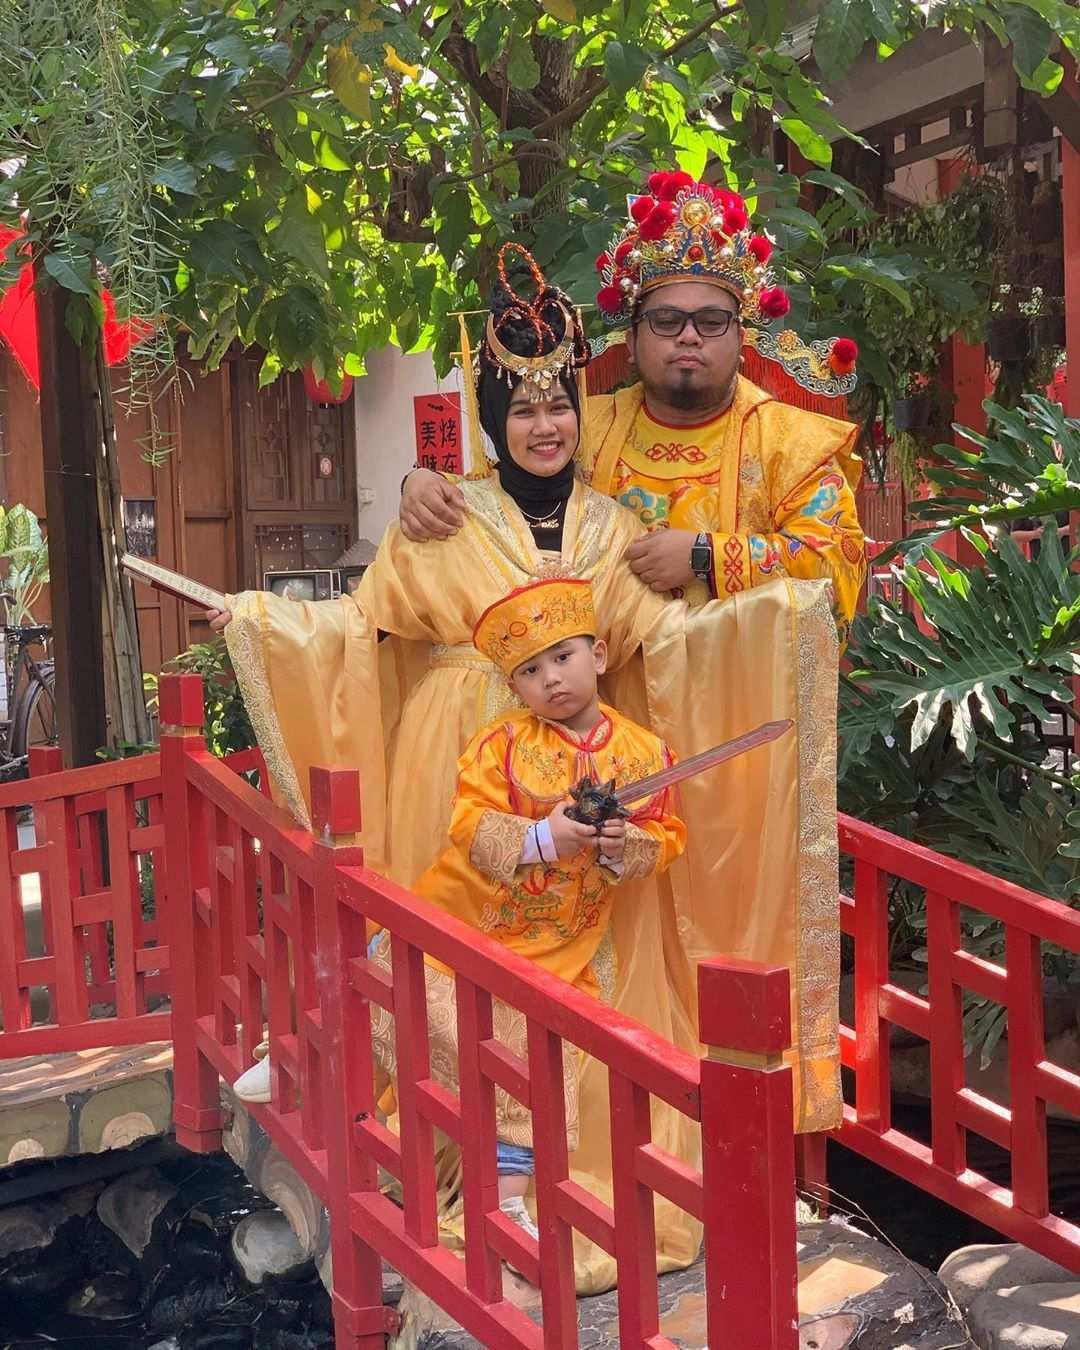 Berfoto Dengan Baju Bernuansa Chinese di Chinatown Bandung, Image From @ fifiebofigantansya